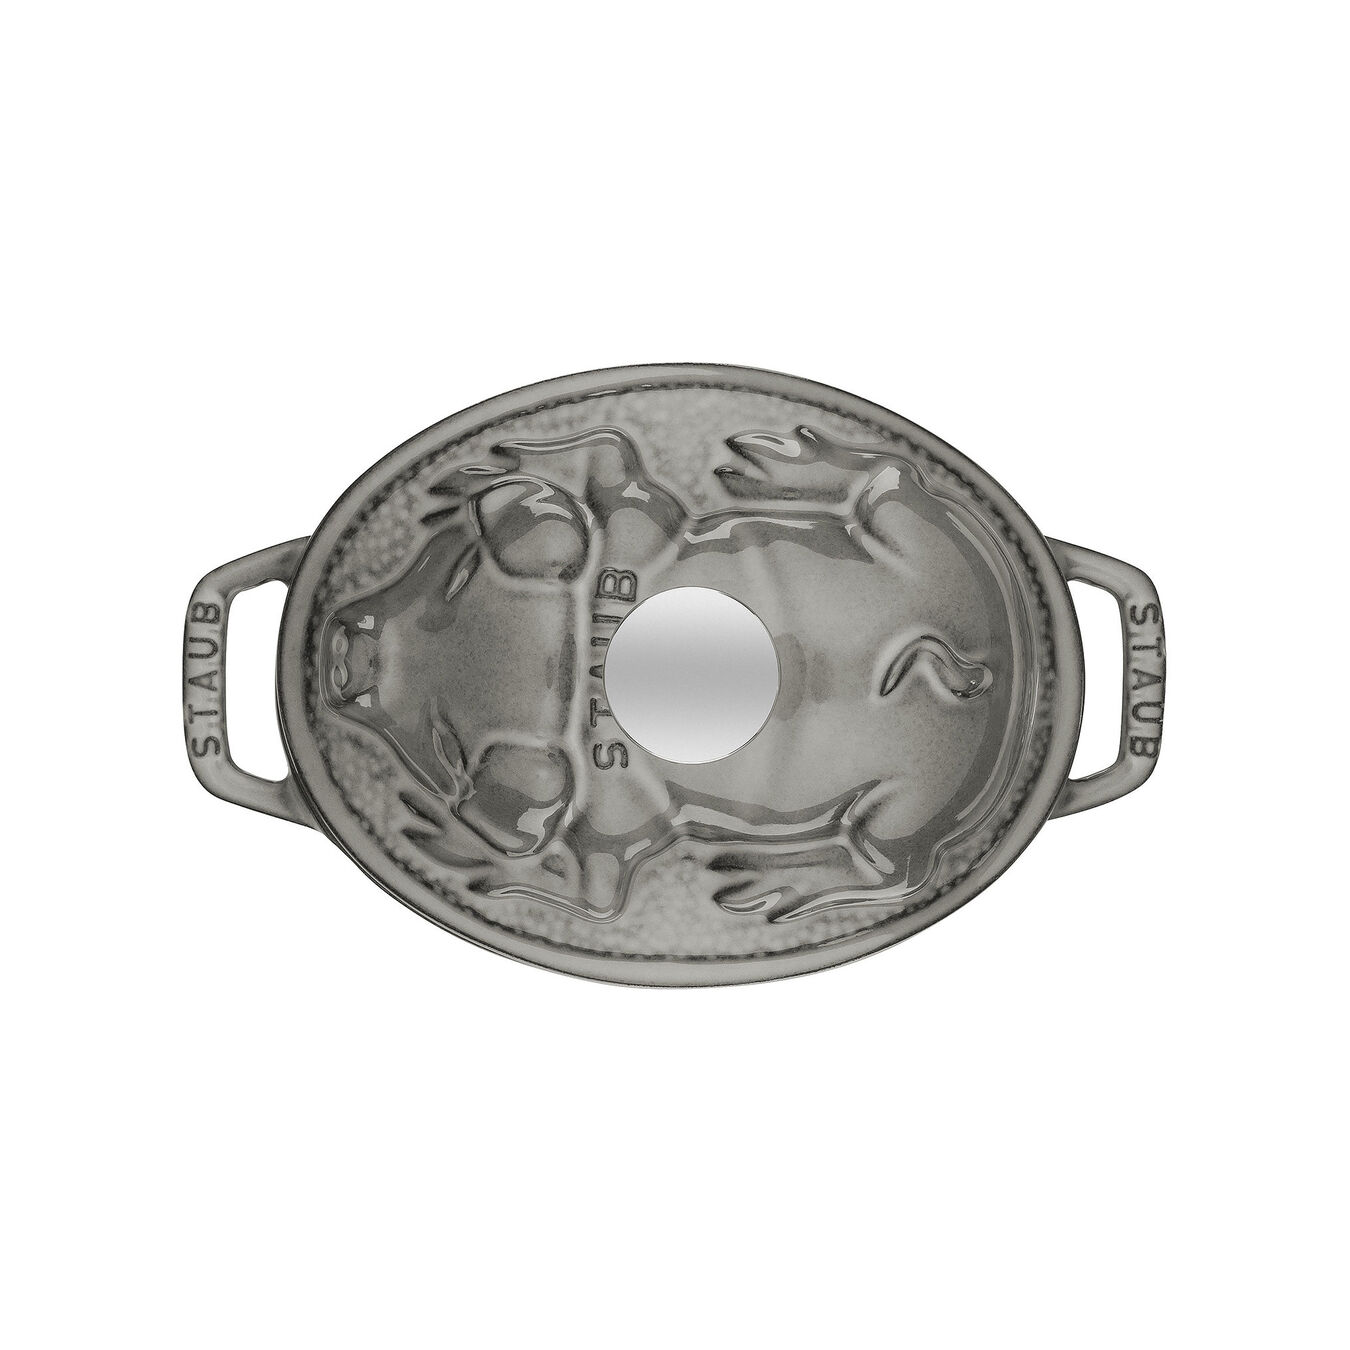 Caçarola 17 cm, oval, Cinza grafite, Ferro fundido,,large 3